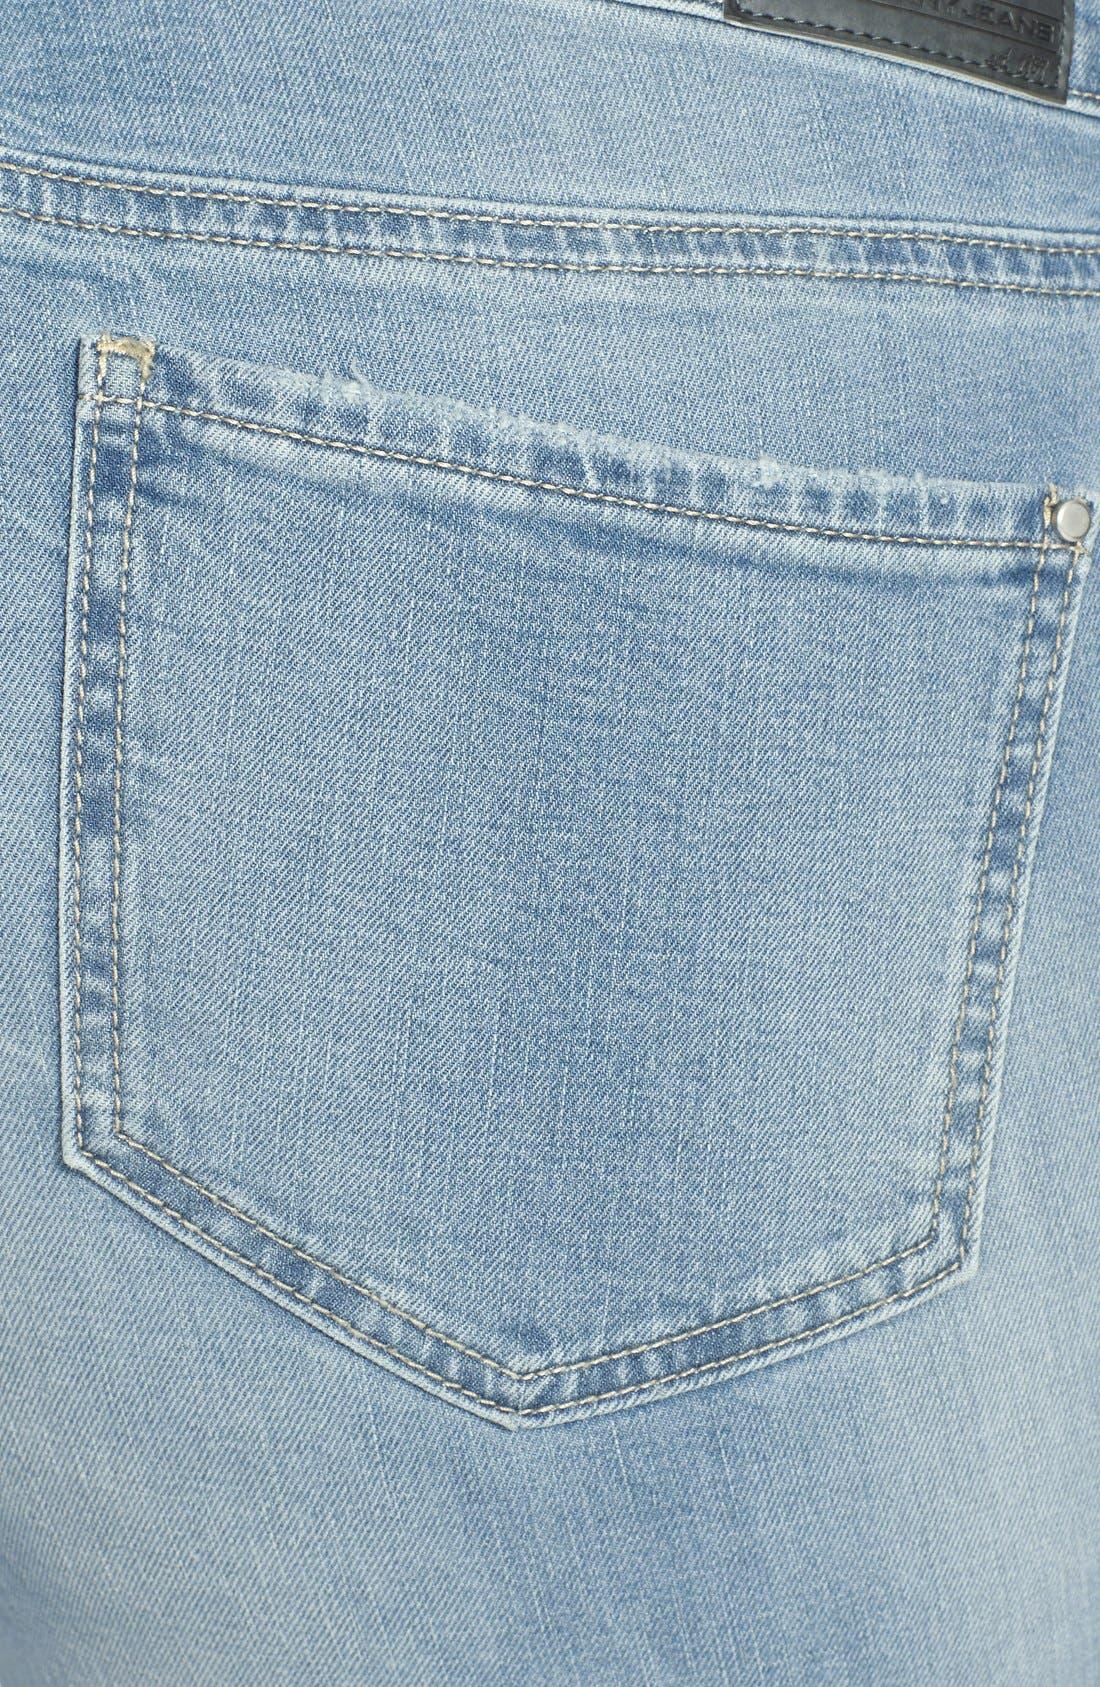 DKNY,                             'Bleecker' Boyfriend Jeans,                             Alternate thumbnail 3, color,                             400